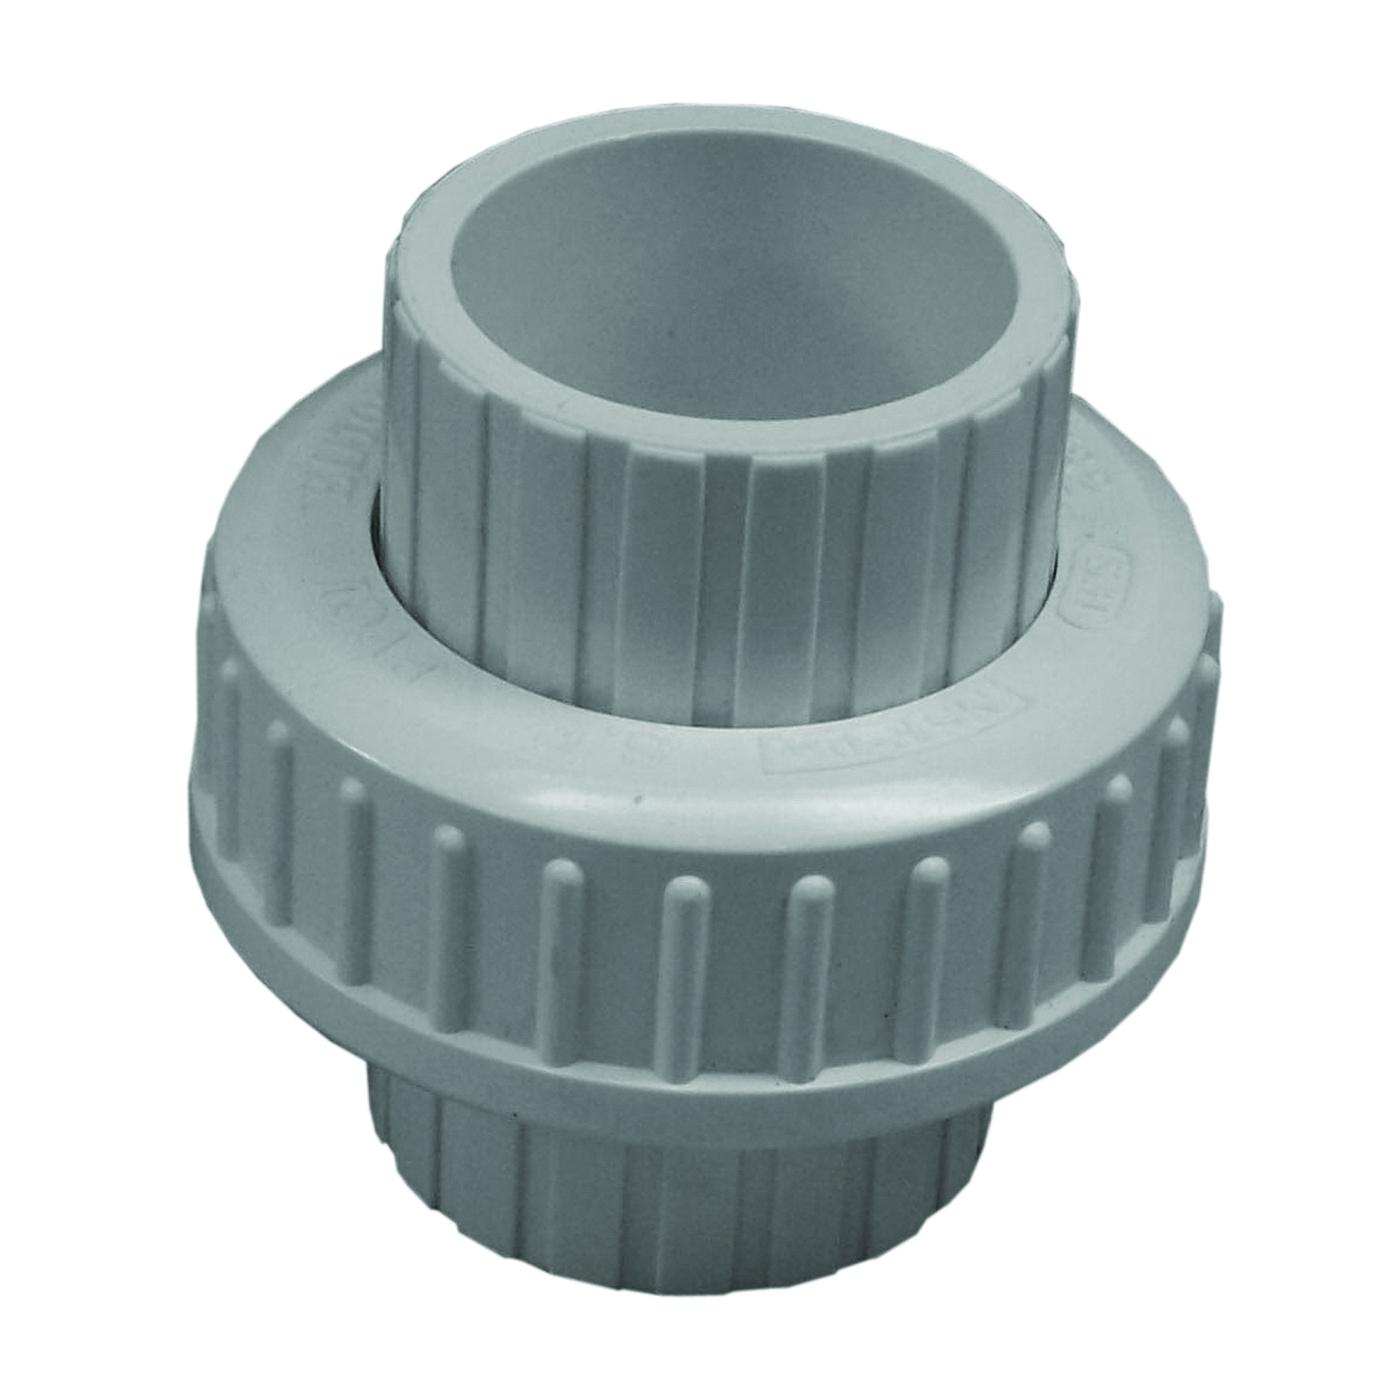 Picture of GENOVA 300 Series 37205 Pipe Union, 1/2 in, Slip Joint, SCH 40 Schedule, 150 psi Pressure